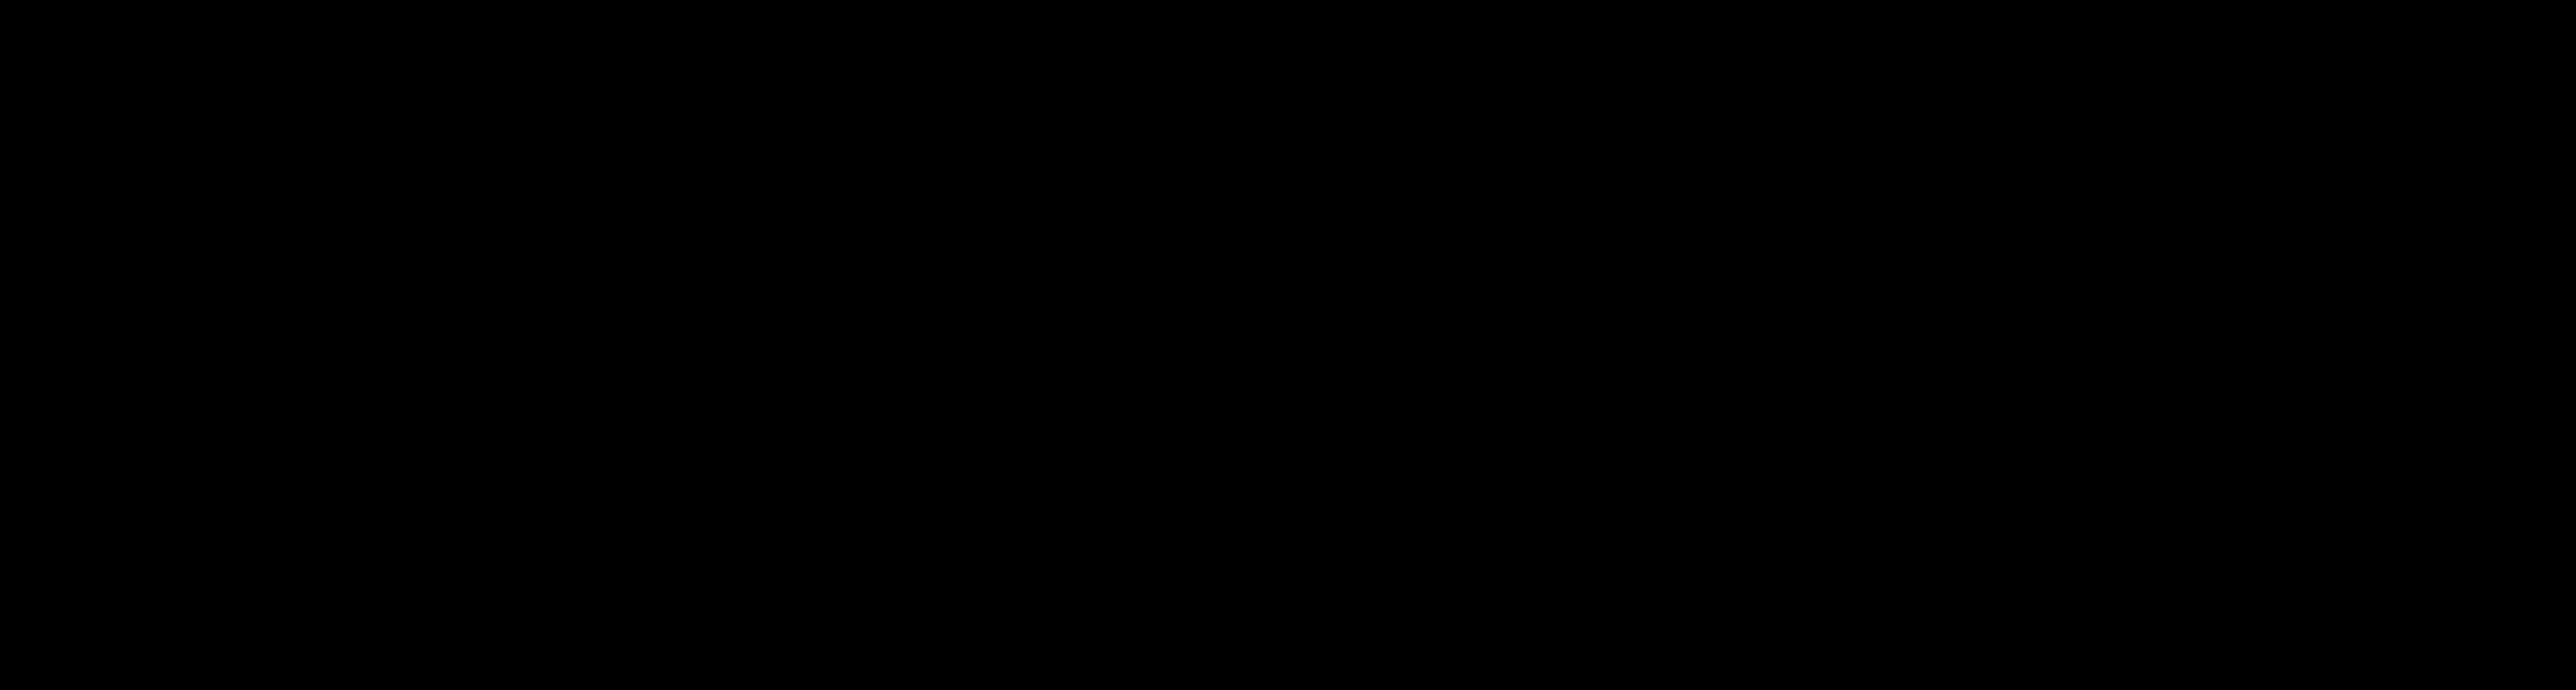 Dibenzocyclooctyne-PEG2-biotin conjugate